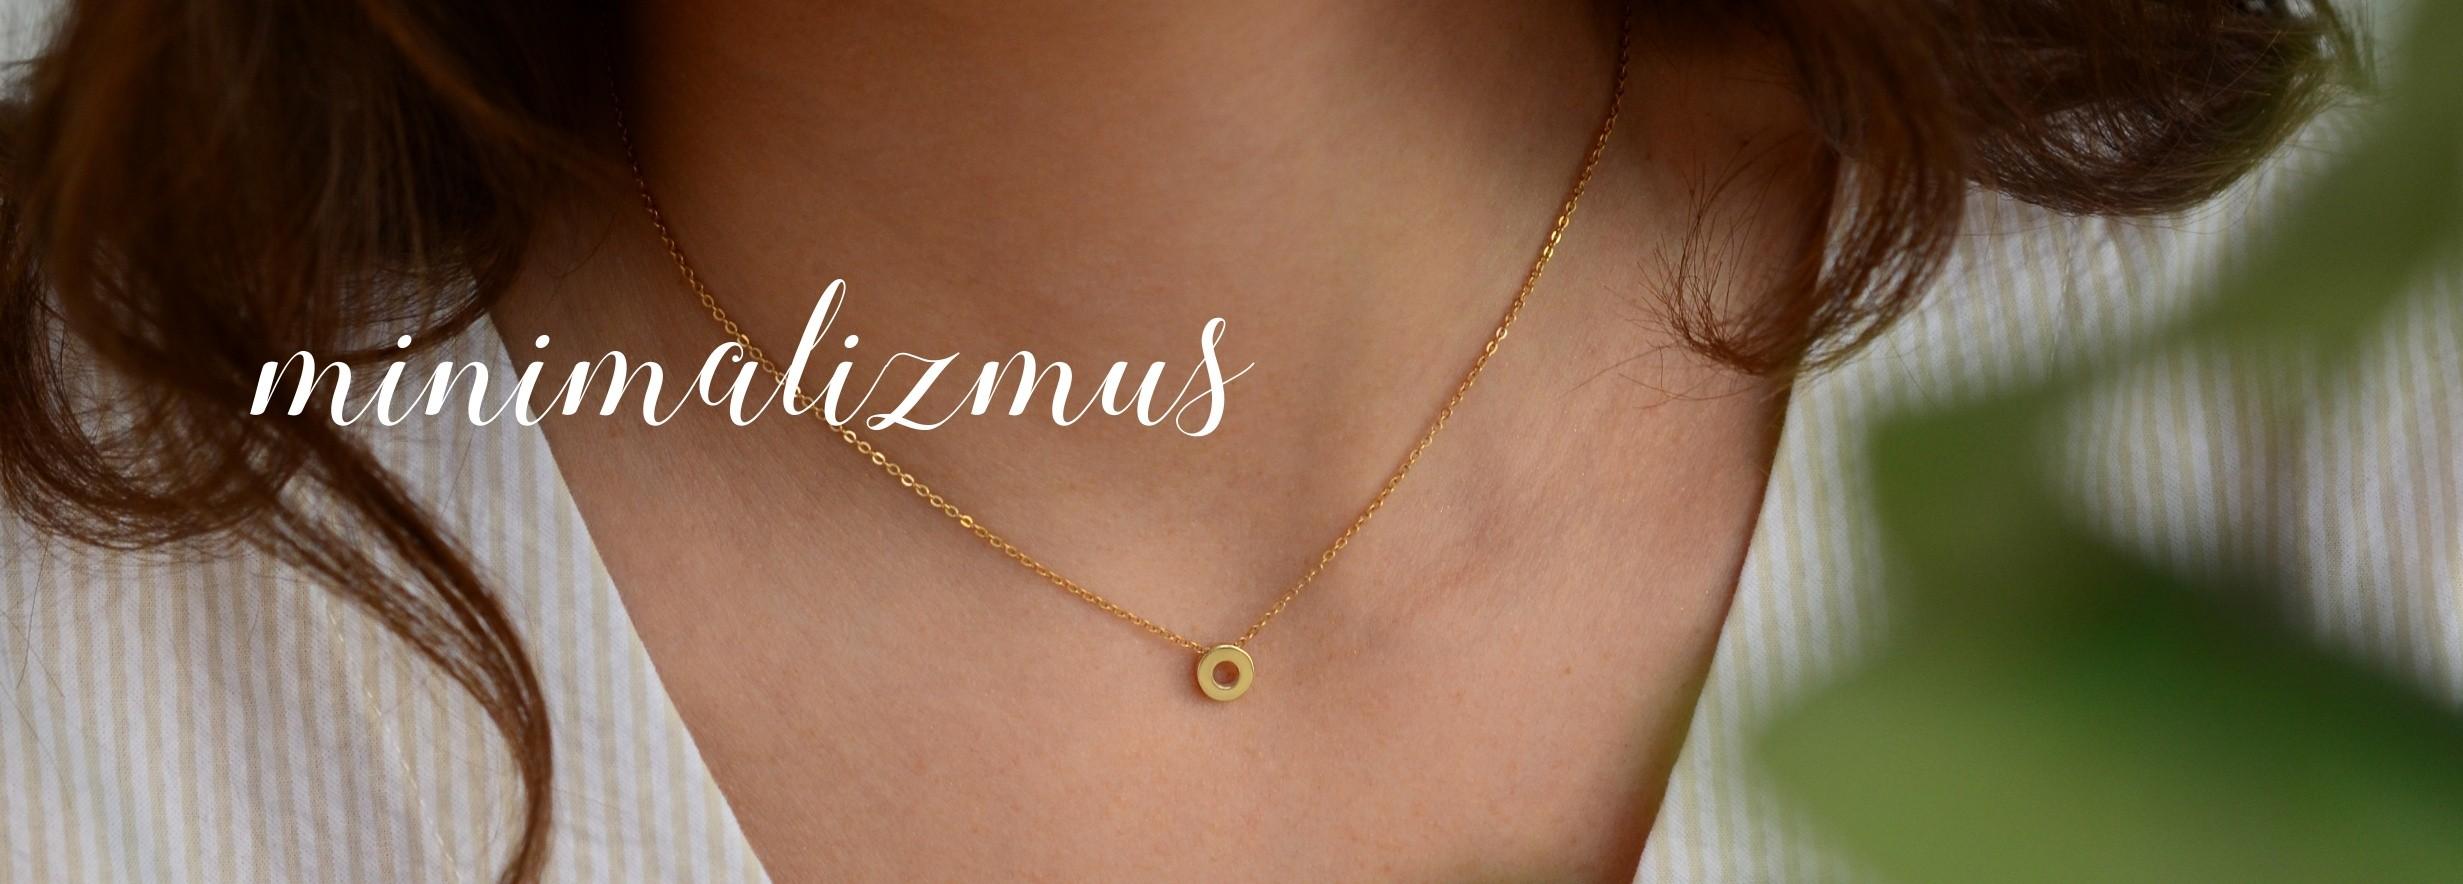 b4a21a871 Šperky s menom